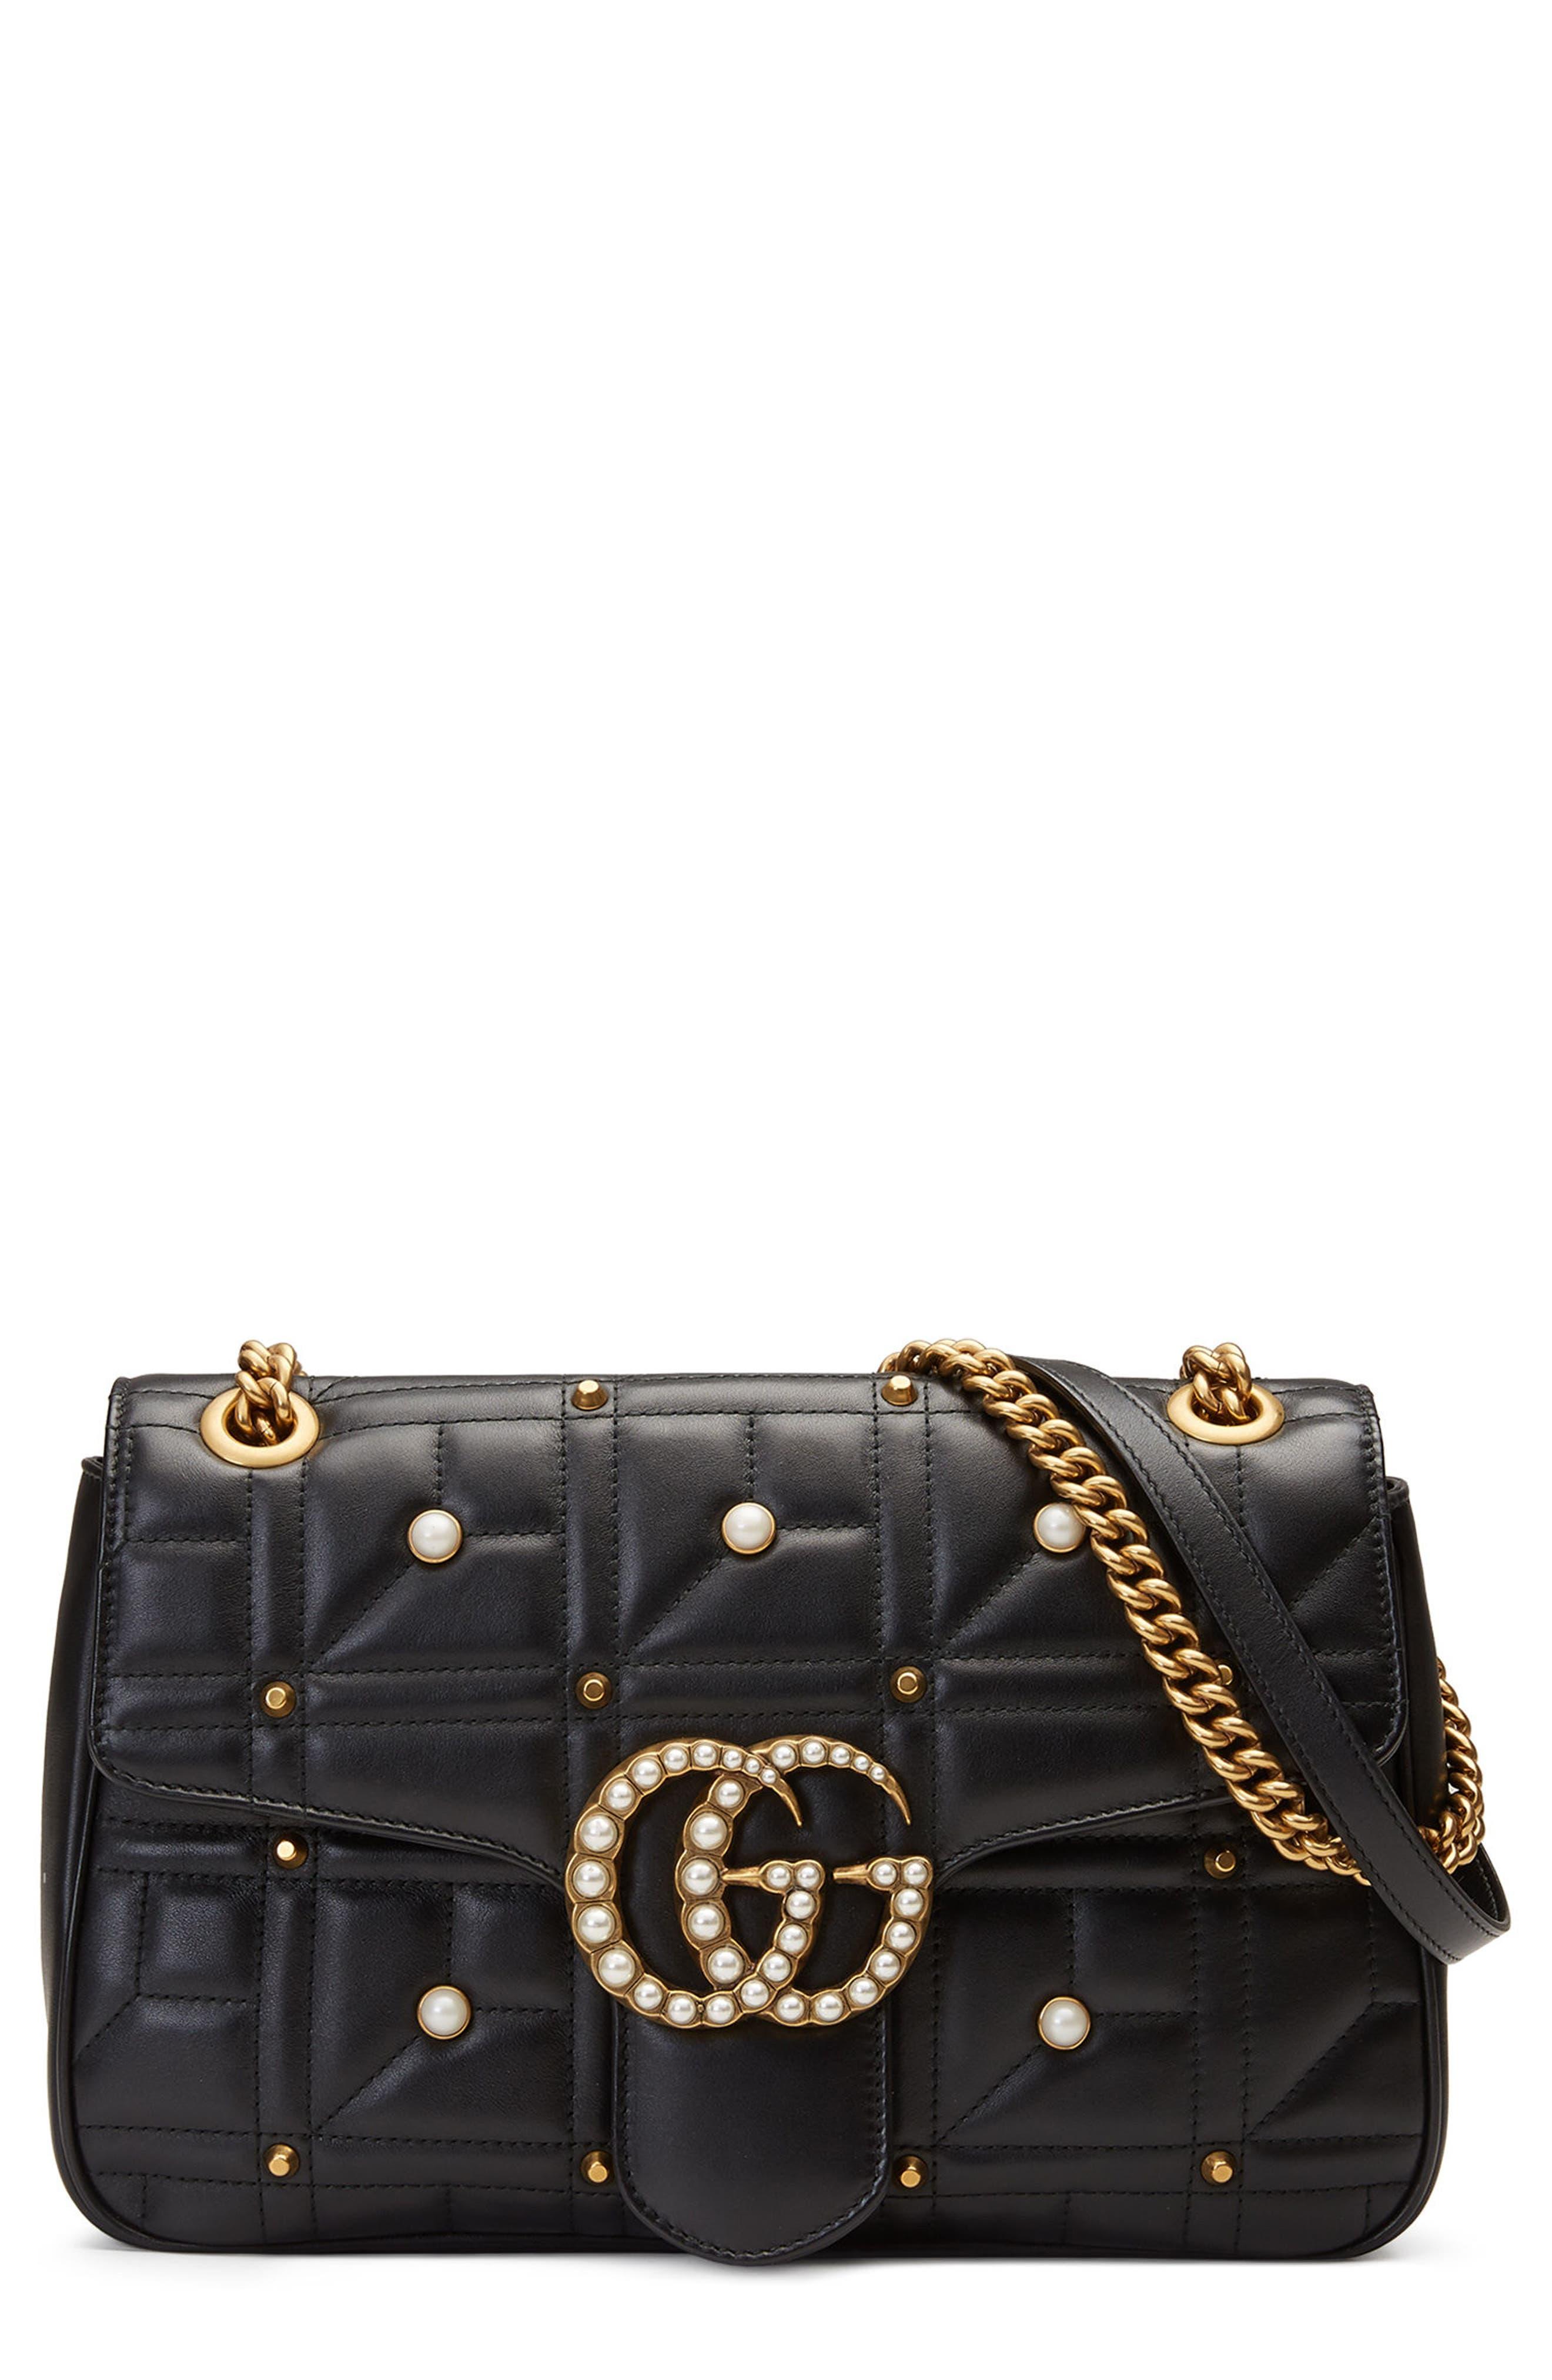 GUCCI GG Marmont 2.0 Imitation Pearl Logo Matelassé Leather Shoulder Bag